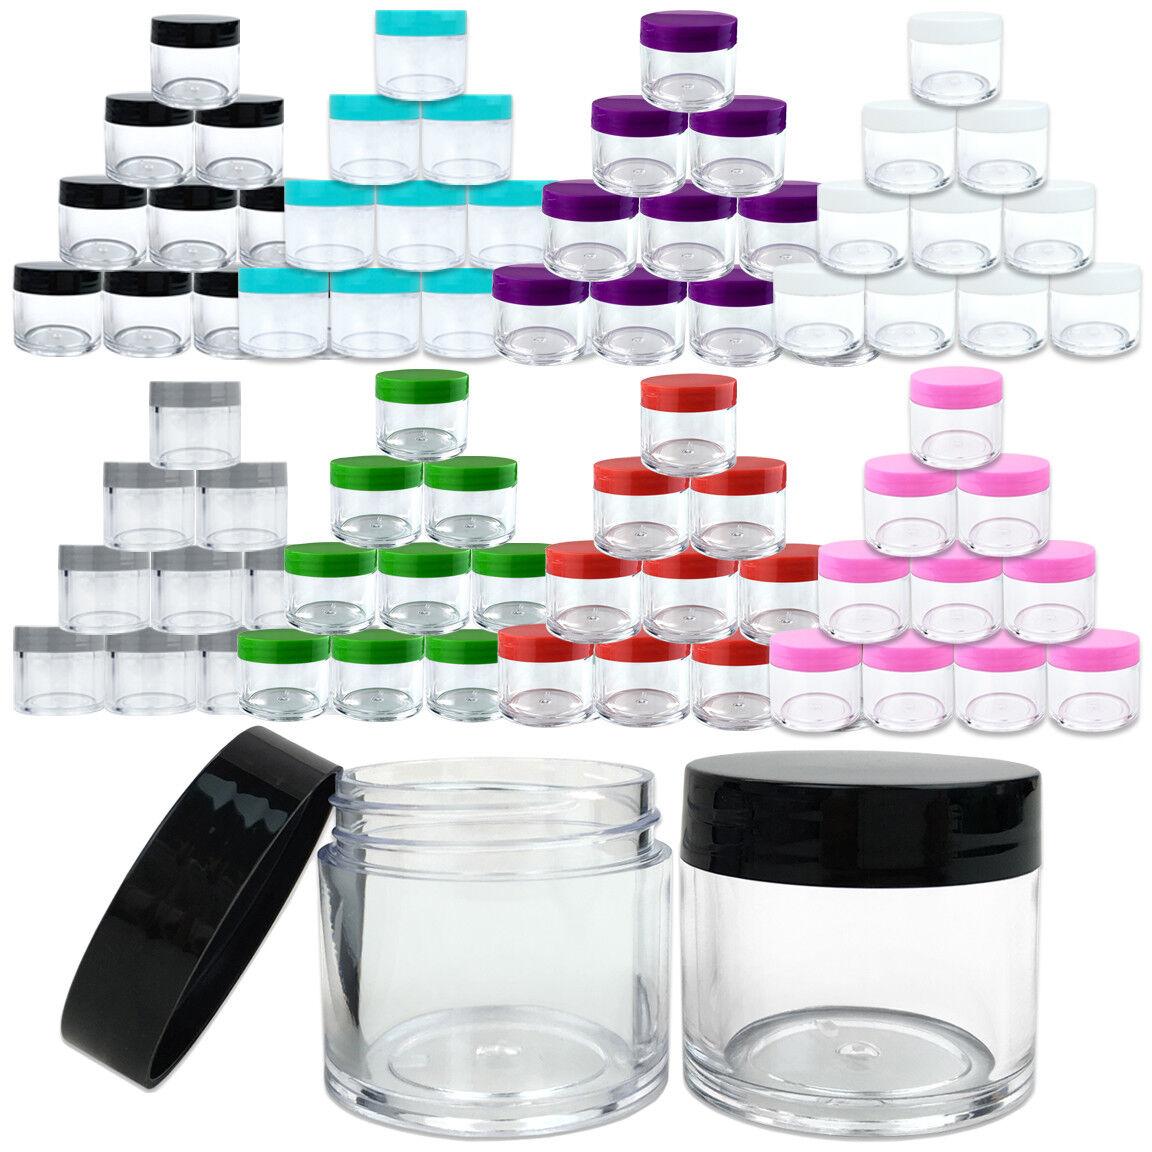 12 High Quality 1oz/30g/30ml Acrylic Plastic Jars Sample Con